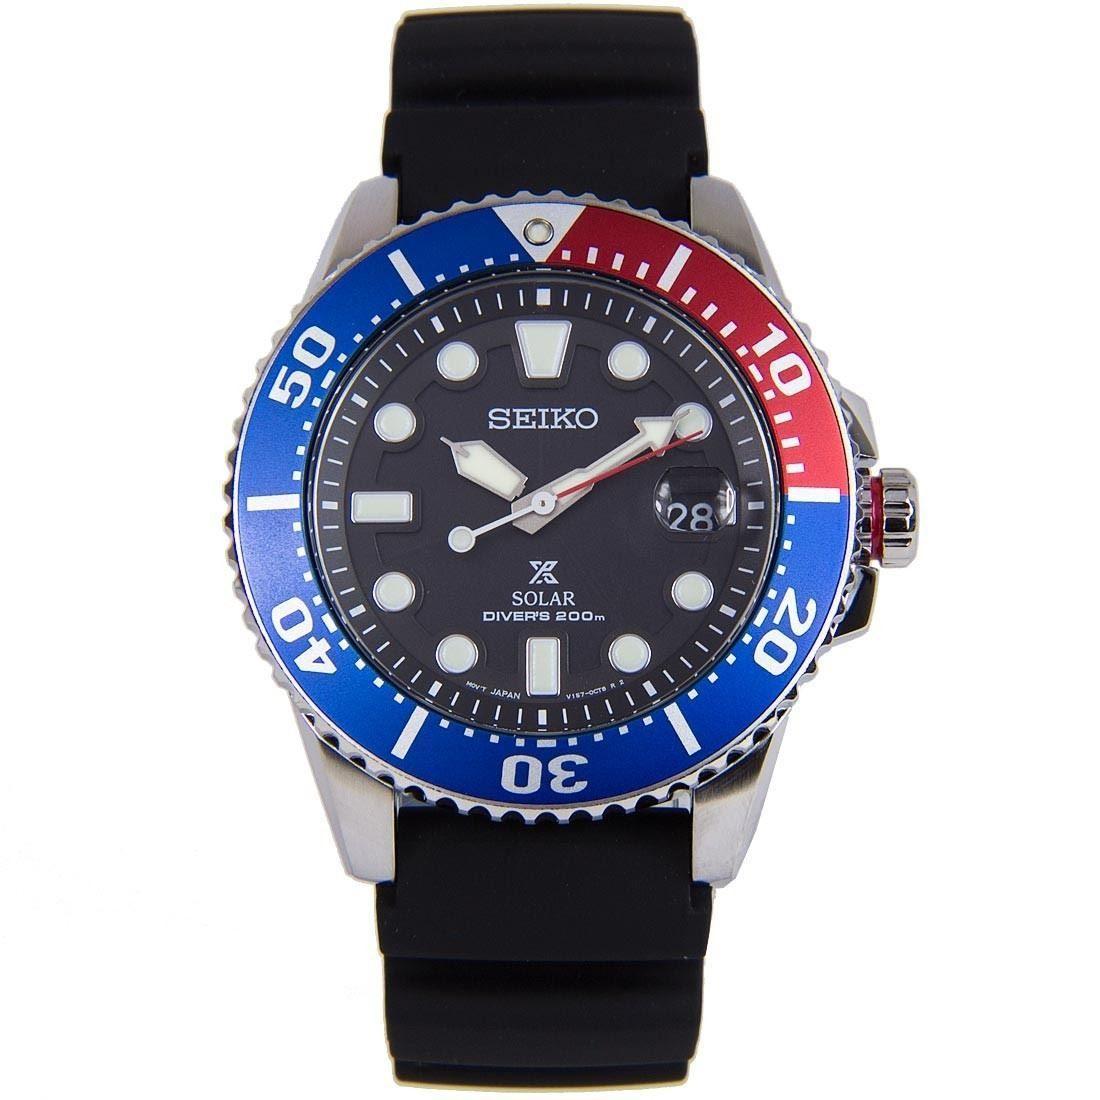 Seiko Sne439p1 Sne439 Sne439p Solar Watch Like Srpb01 Order Original Prospex Diver Stainless Steel Free Fast Shipping To Usa Canada Australia New Zealand Singapore Hong Kong Japan